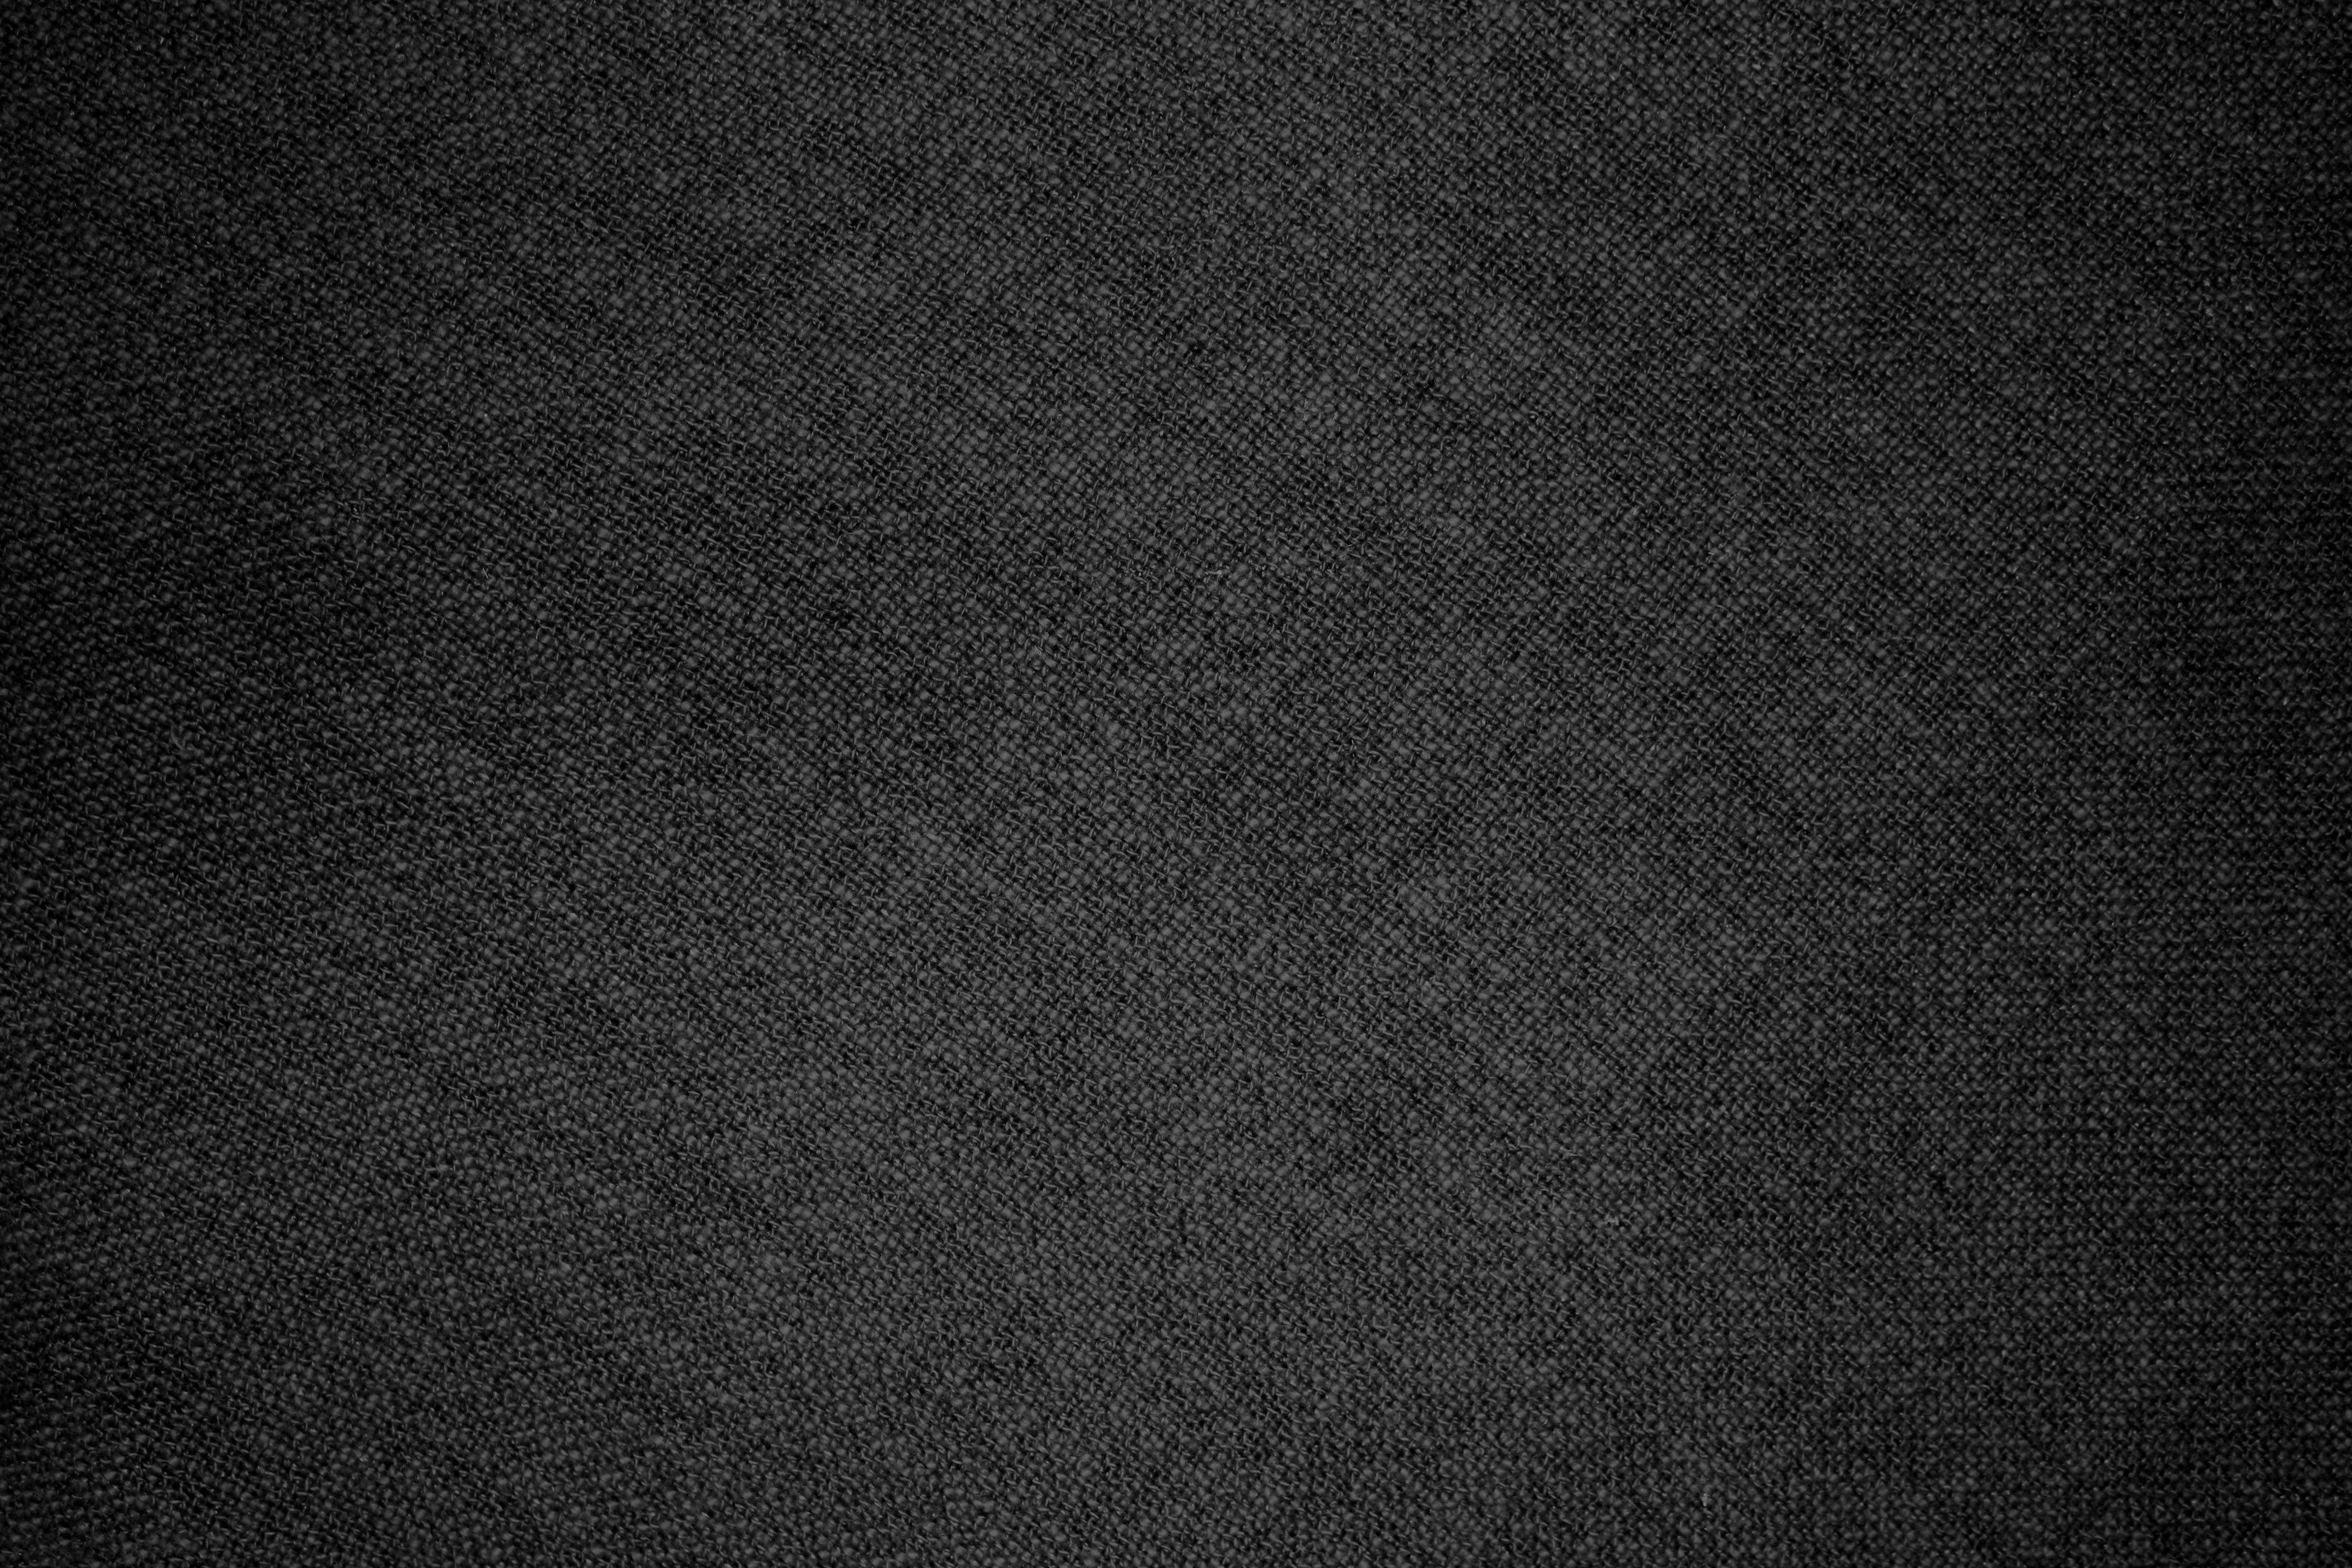 Black Fabric Texture   High Resolution Photo   Dimensions 3888 3888x2592